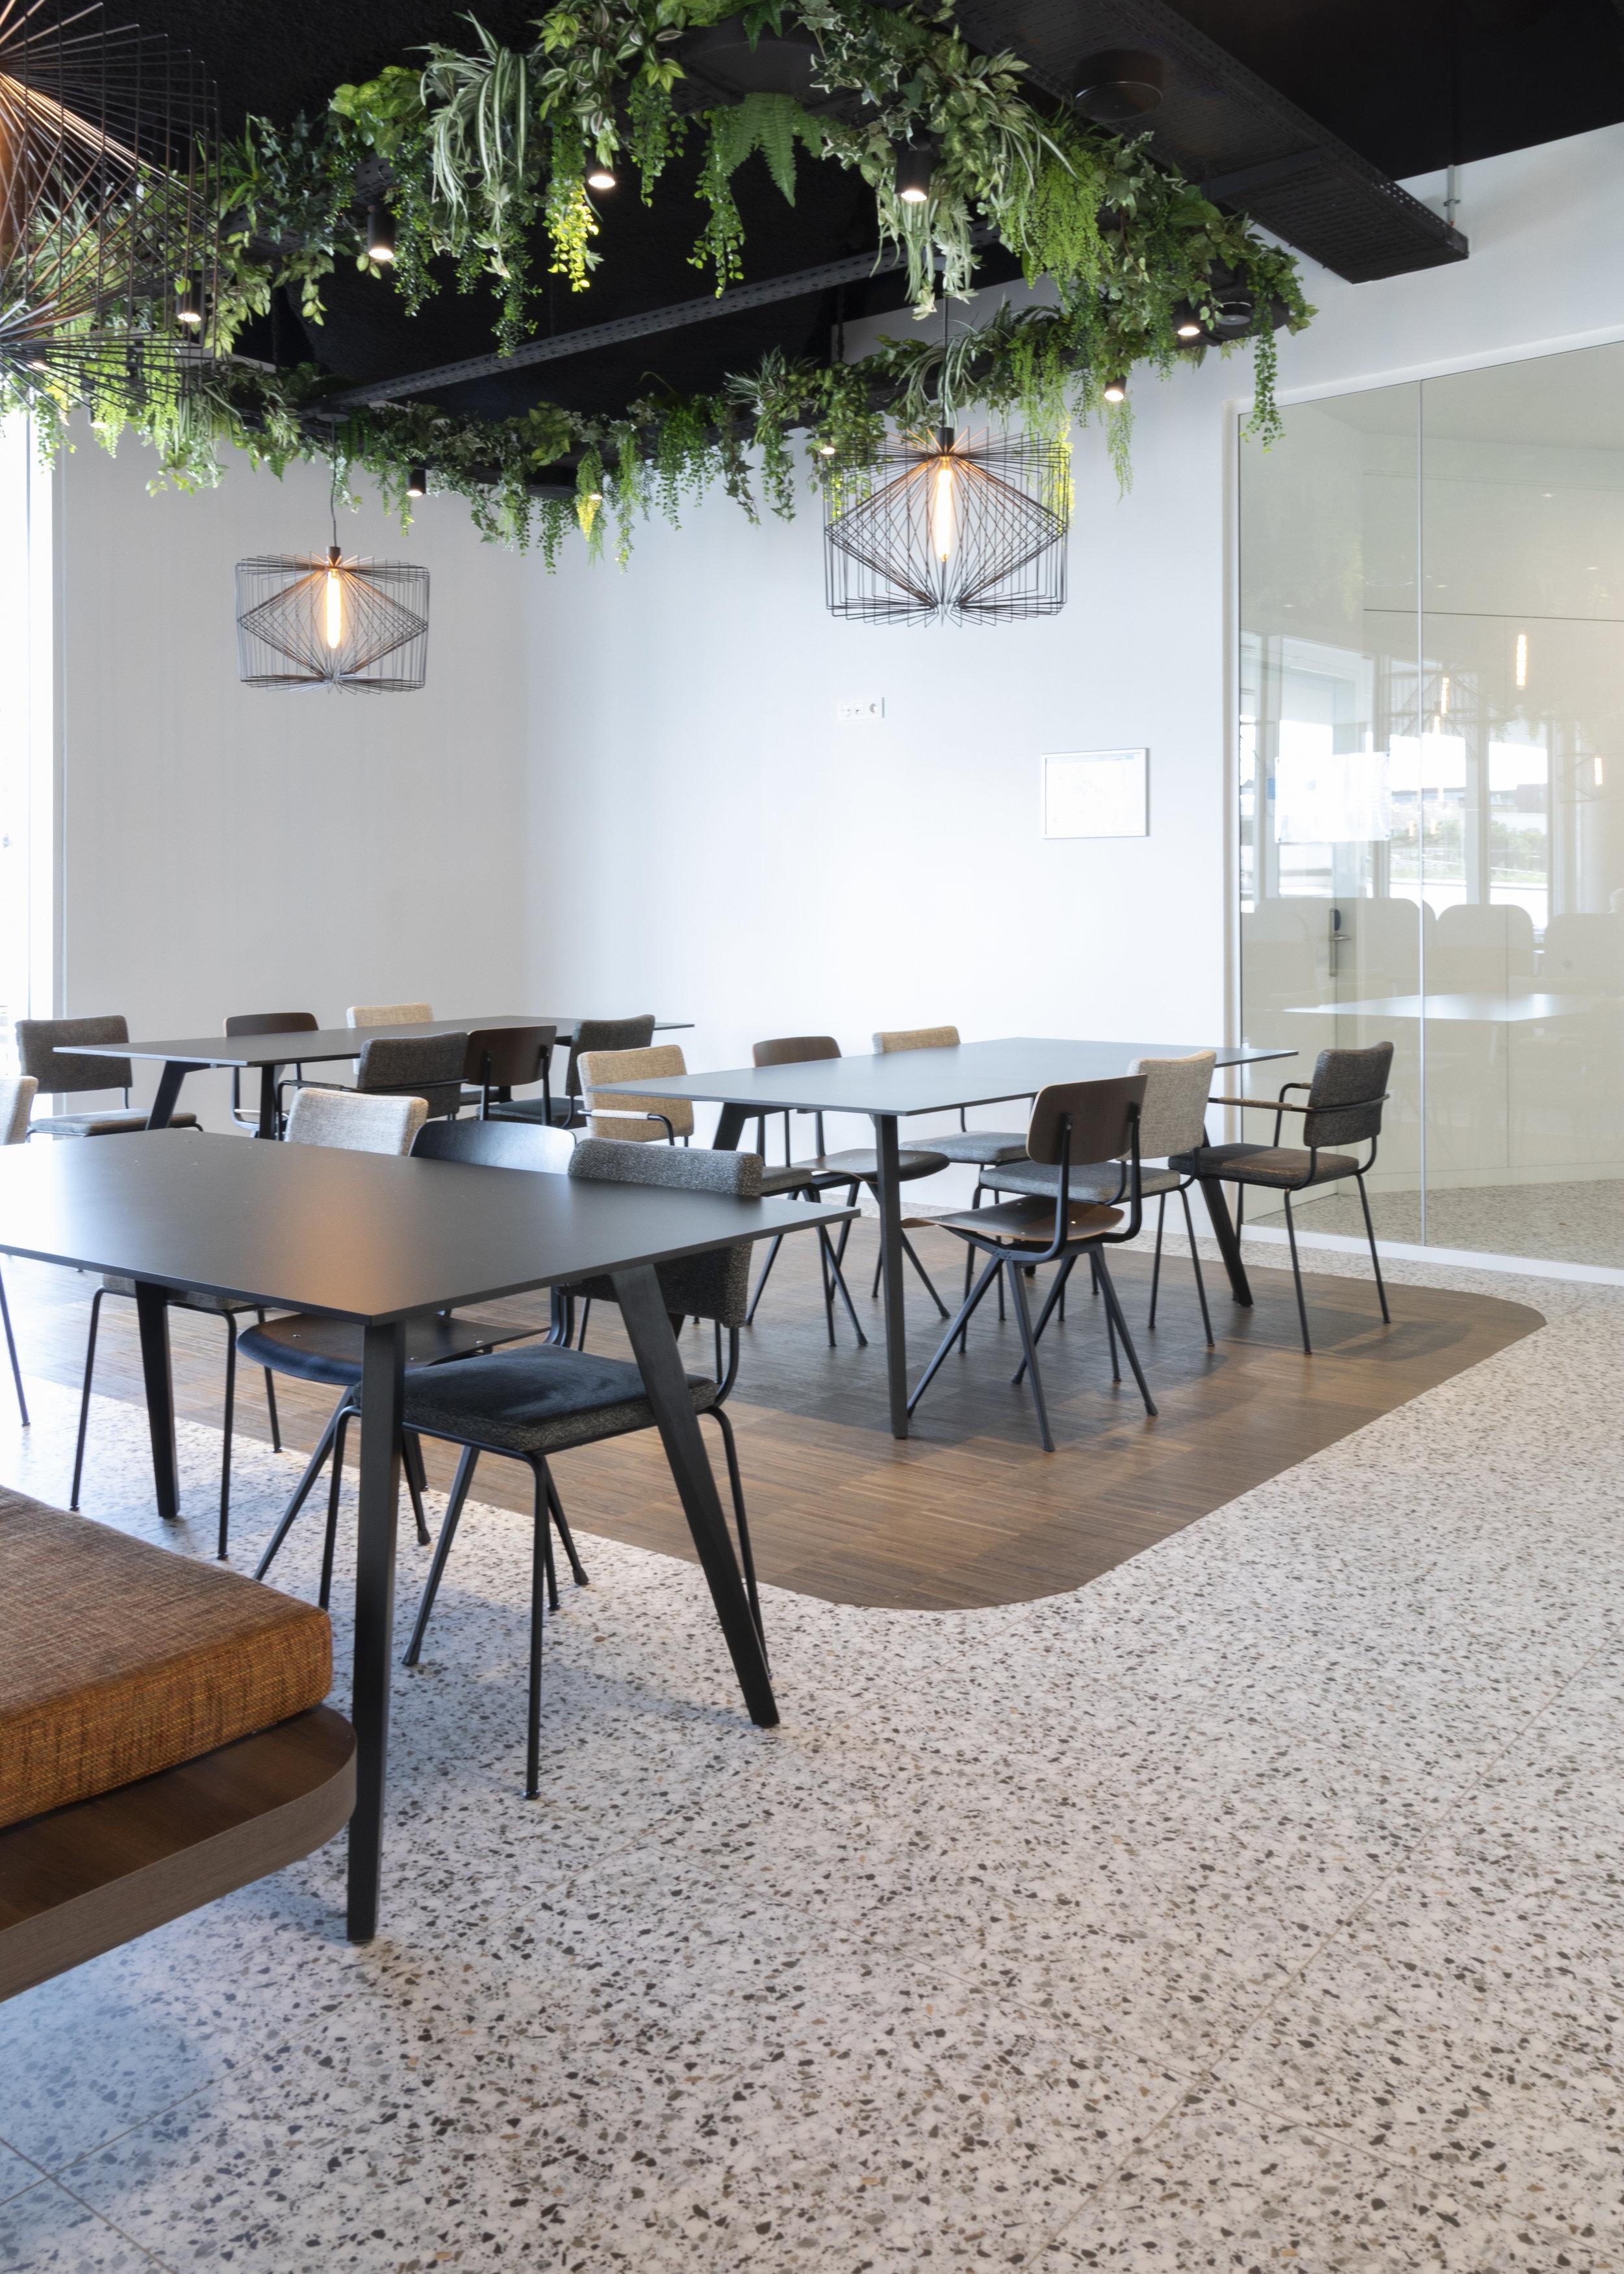 Digital plan for meeting room design